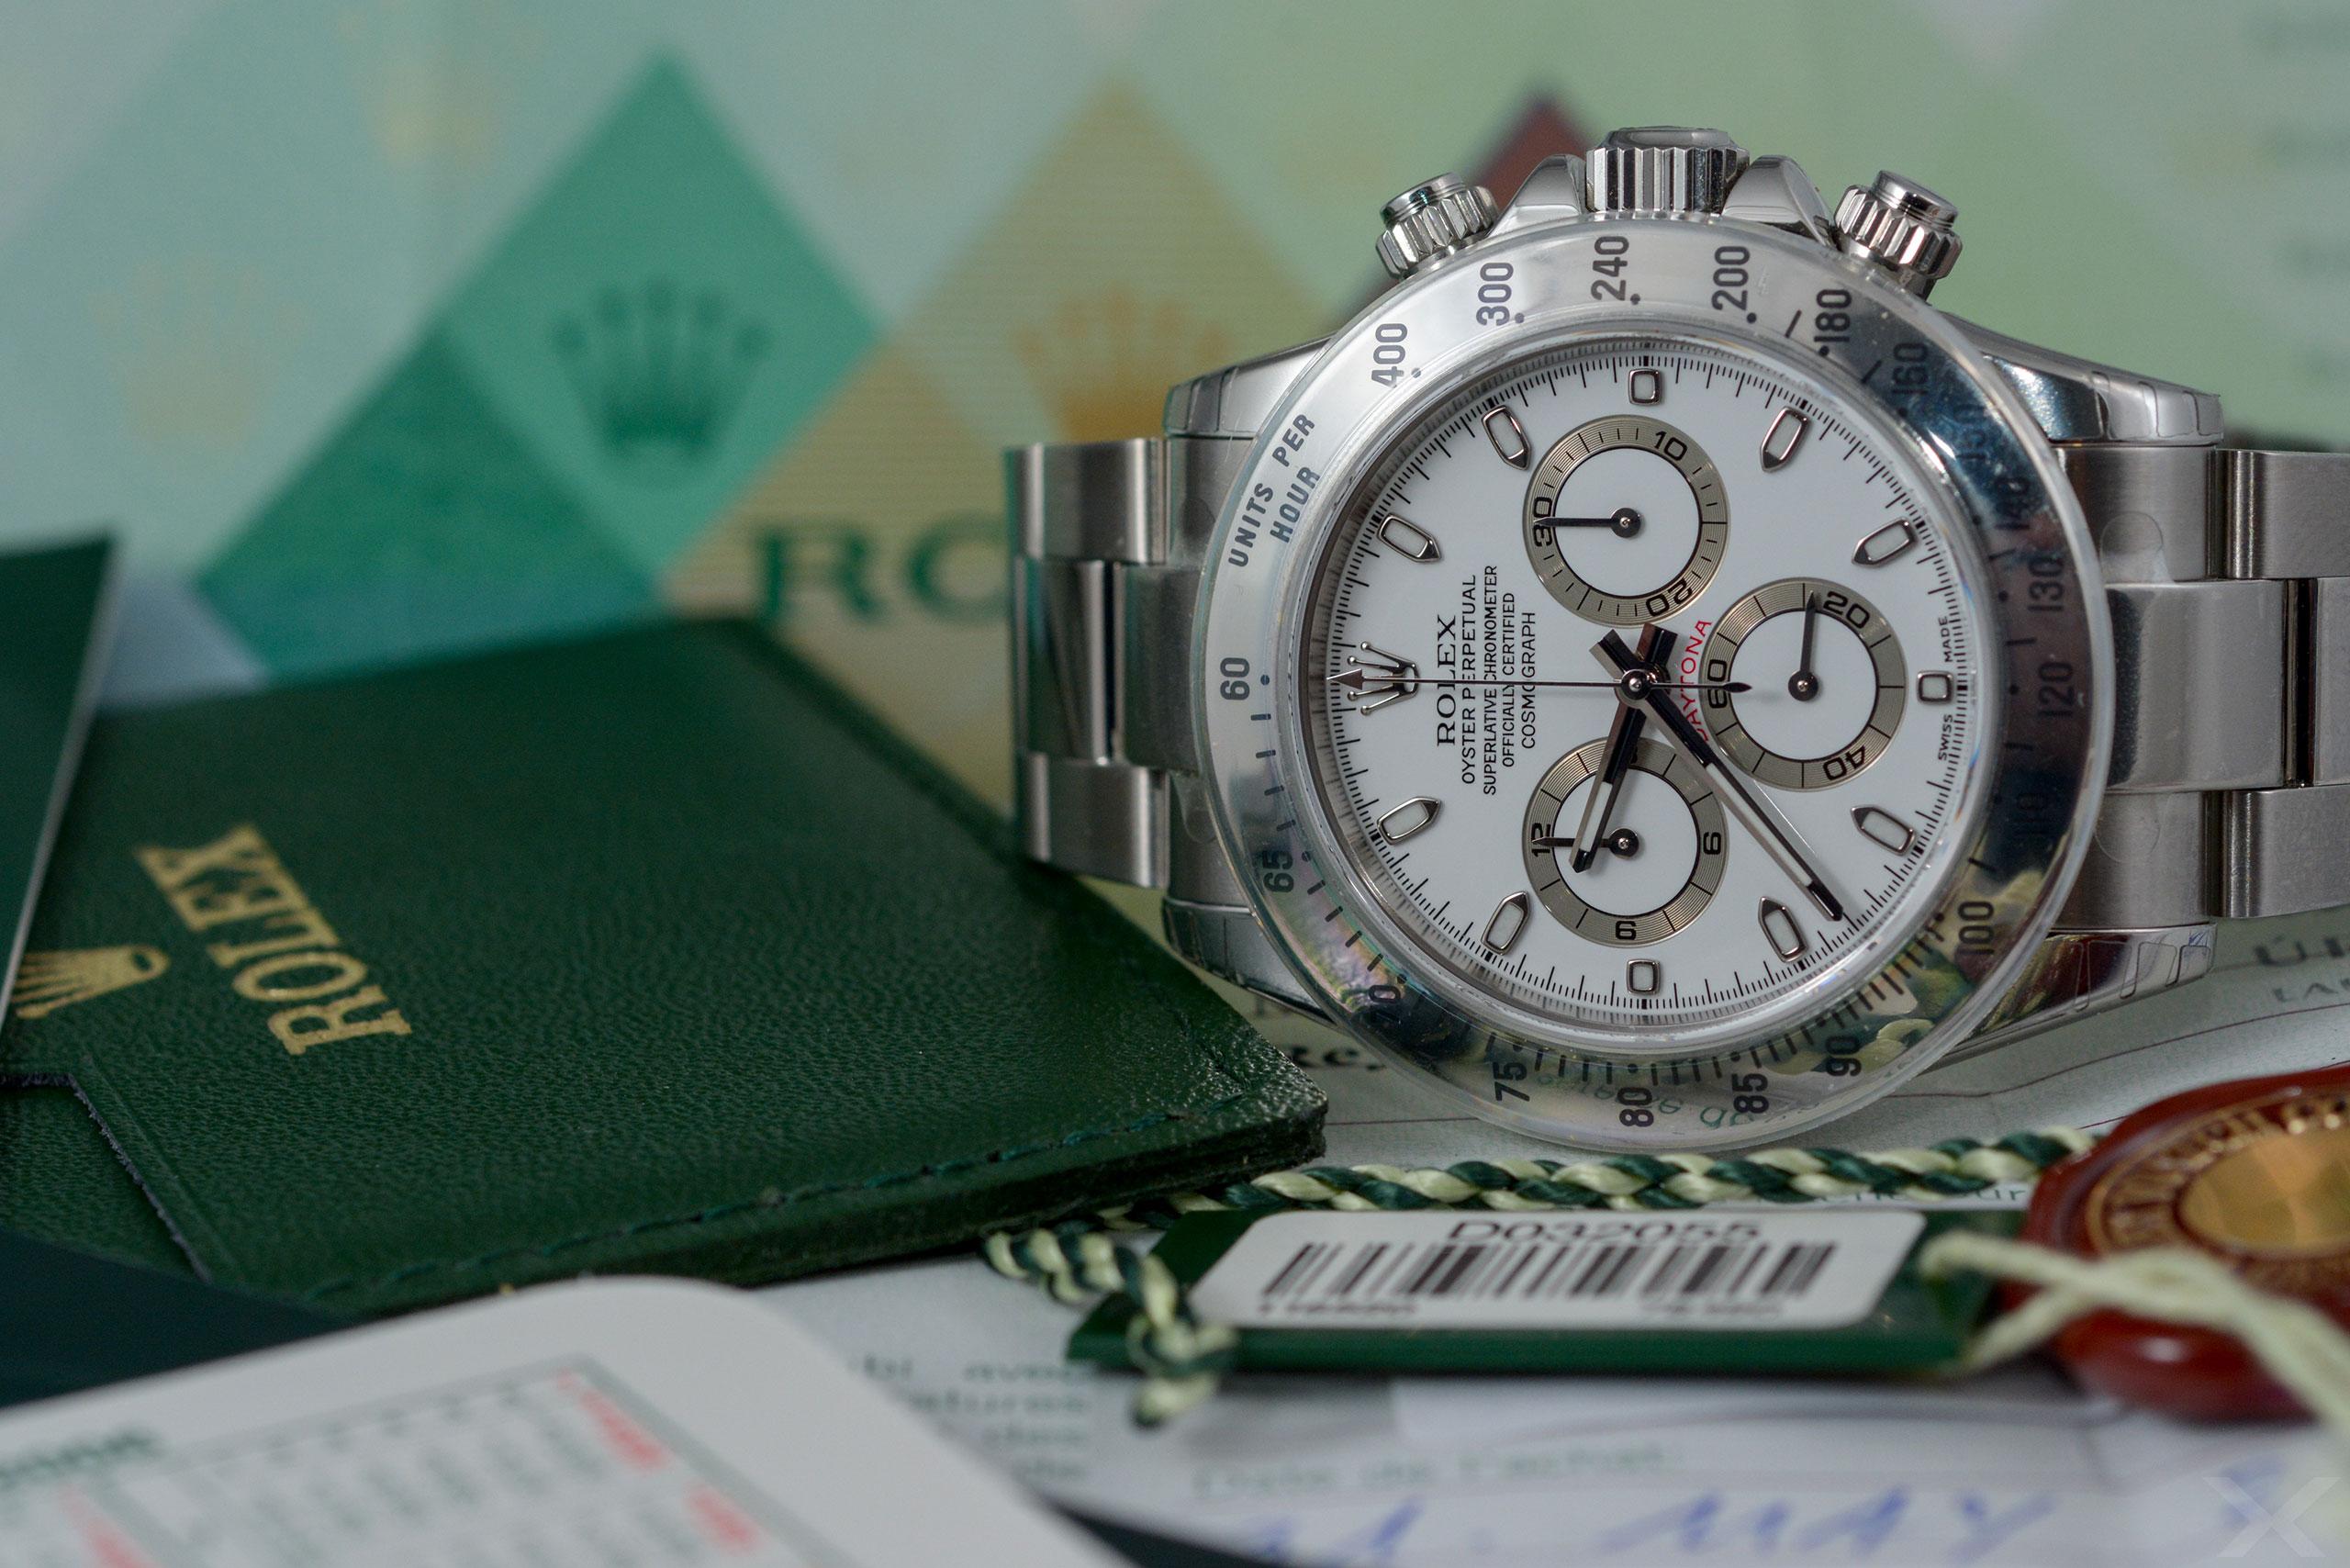 Rolex Daytona, Ref. 116520 Dr. Crott Luxify